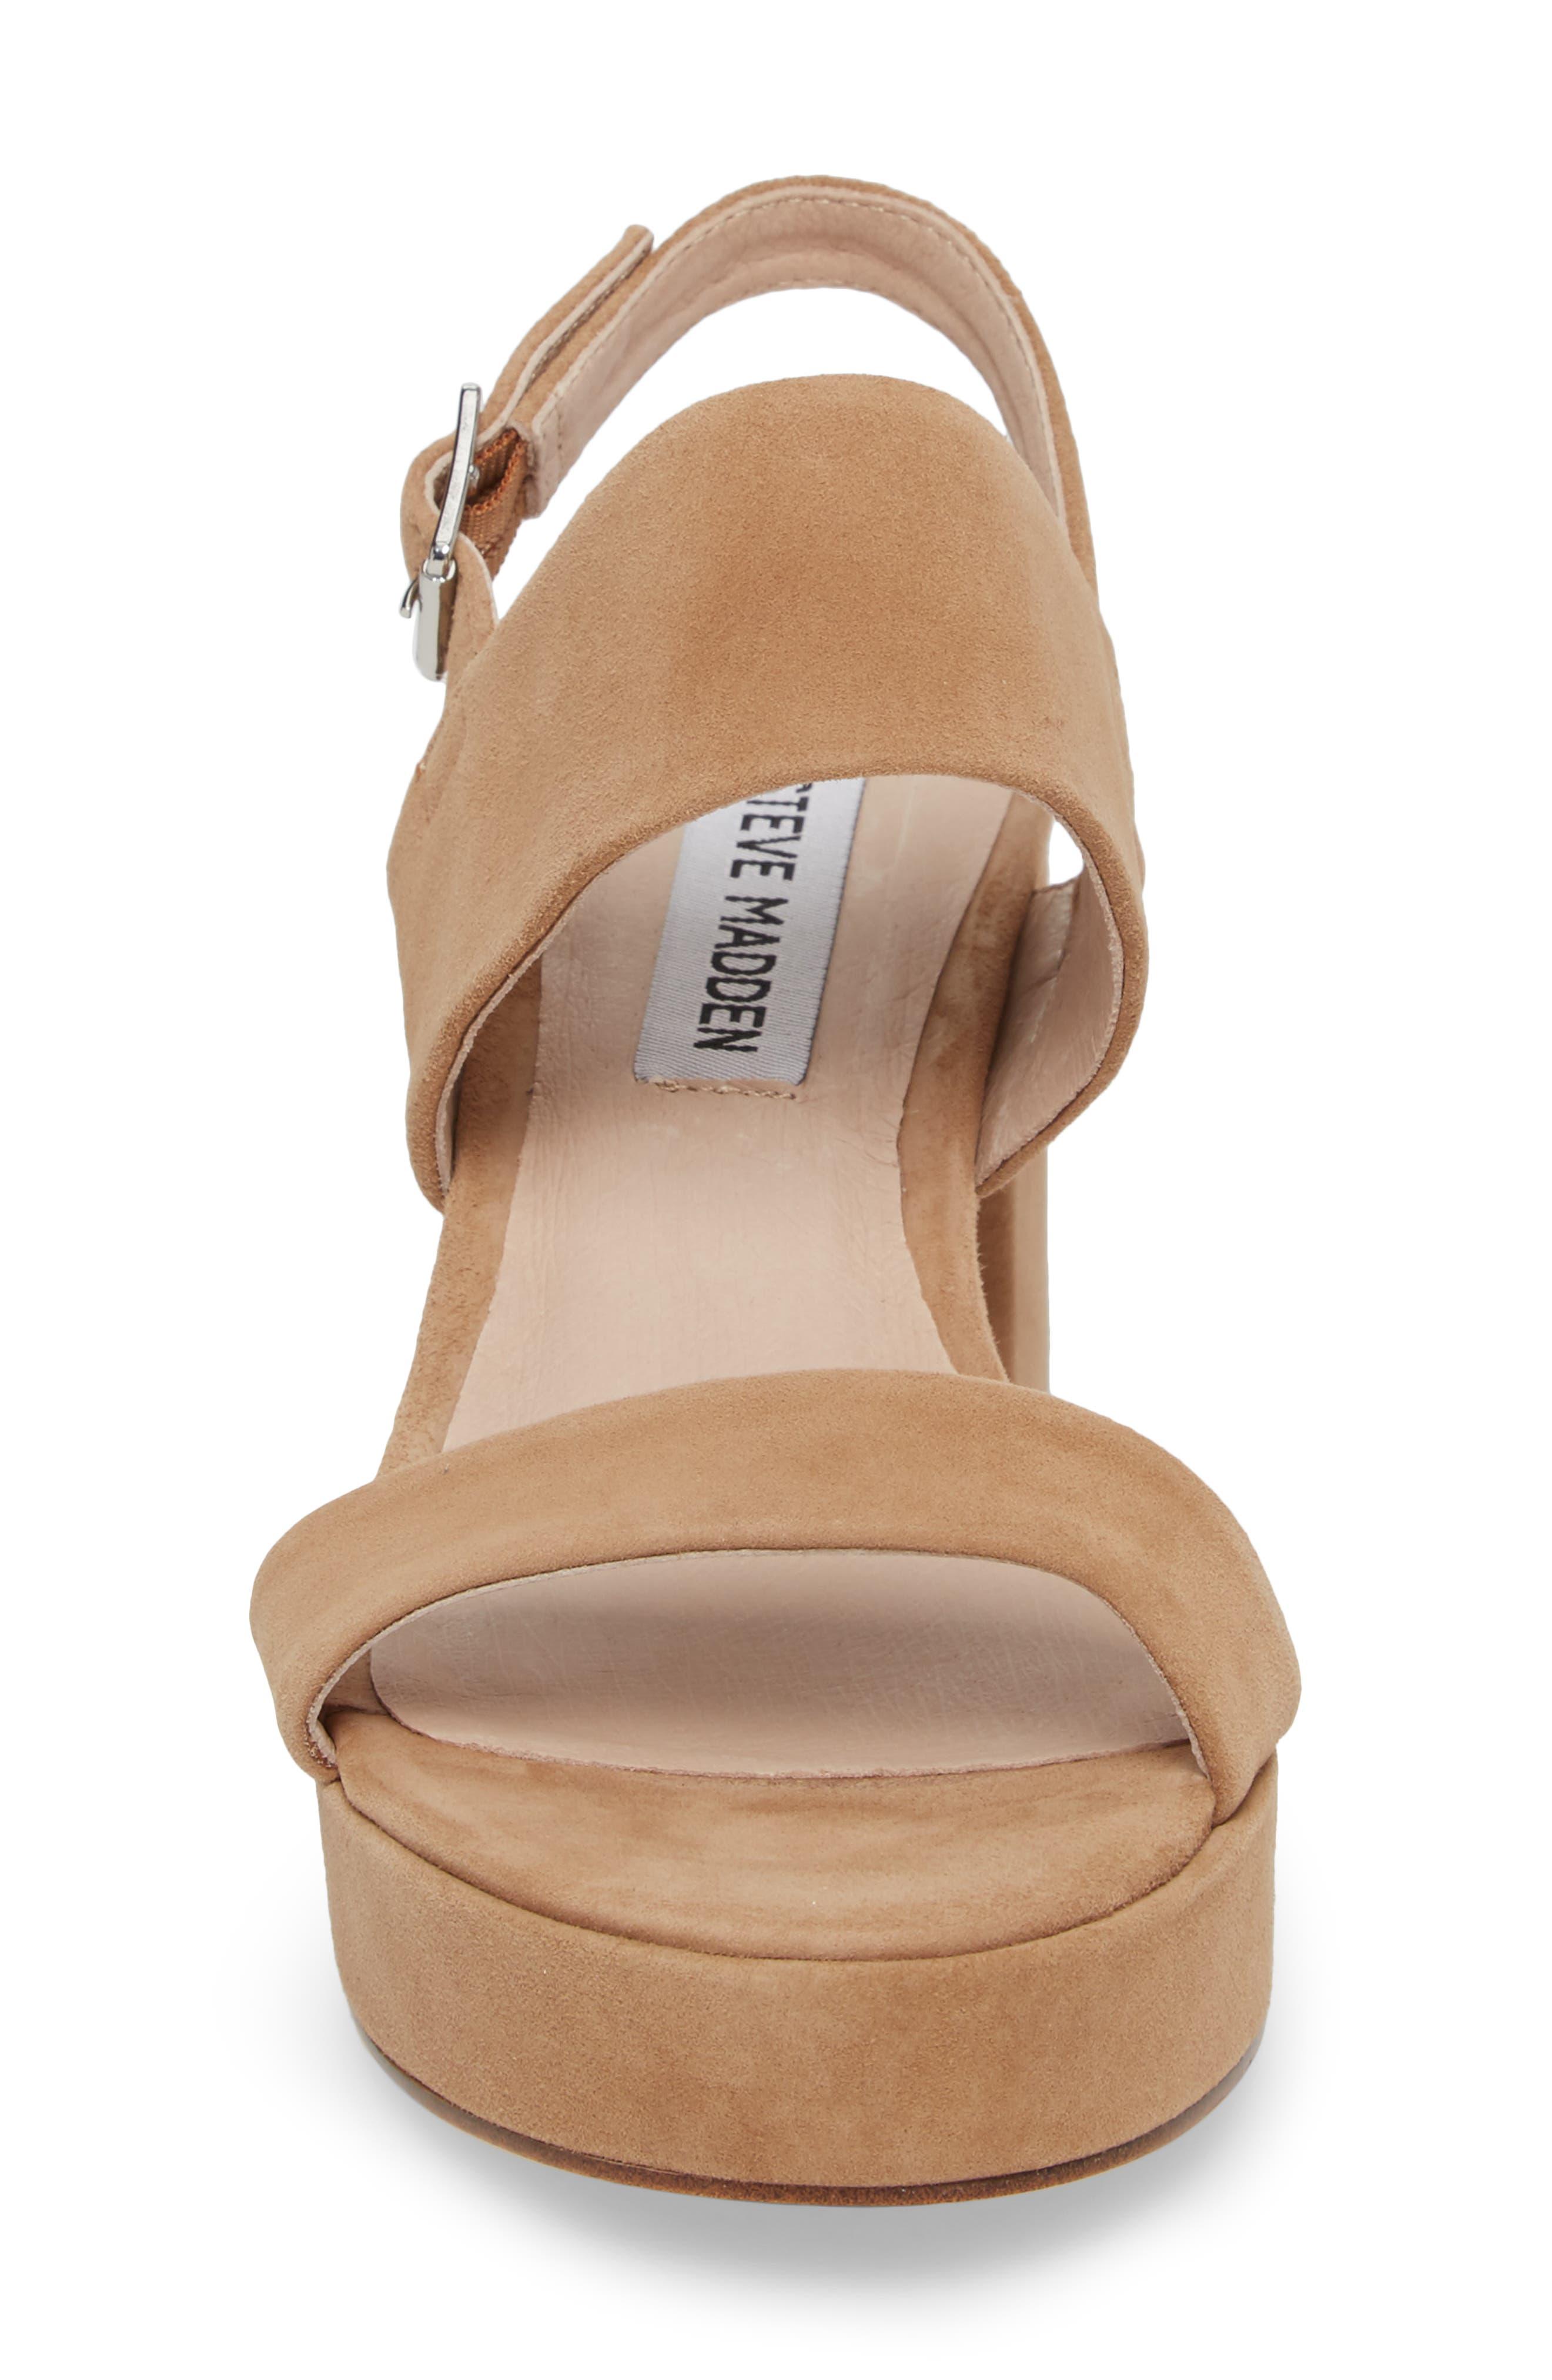 Reba Slingback Platform Sandal,                             Alternate thumbnail 4, color,                             TAN SUEDE